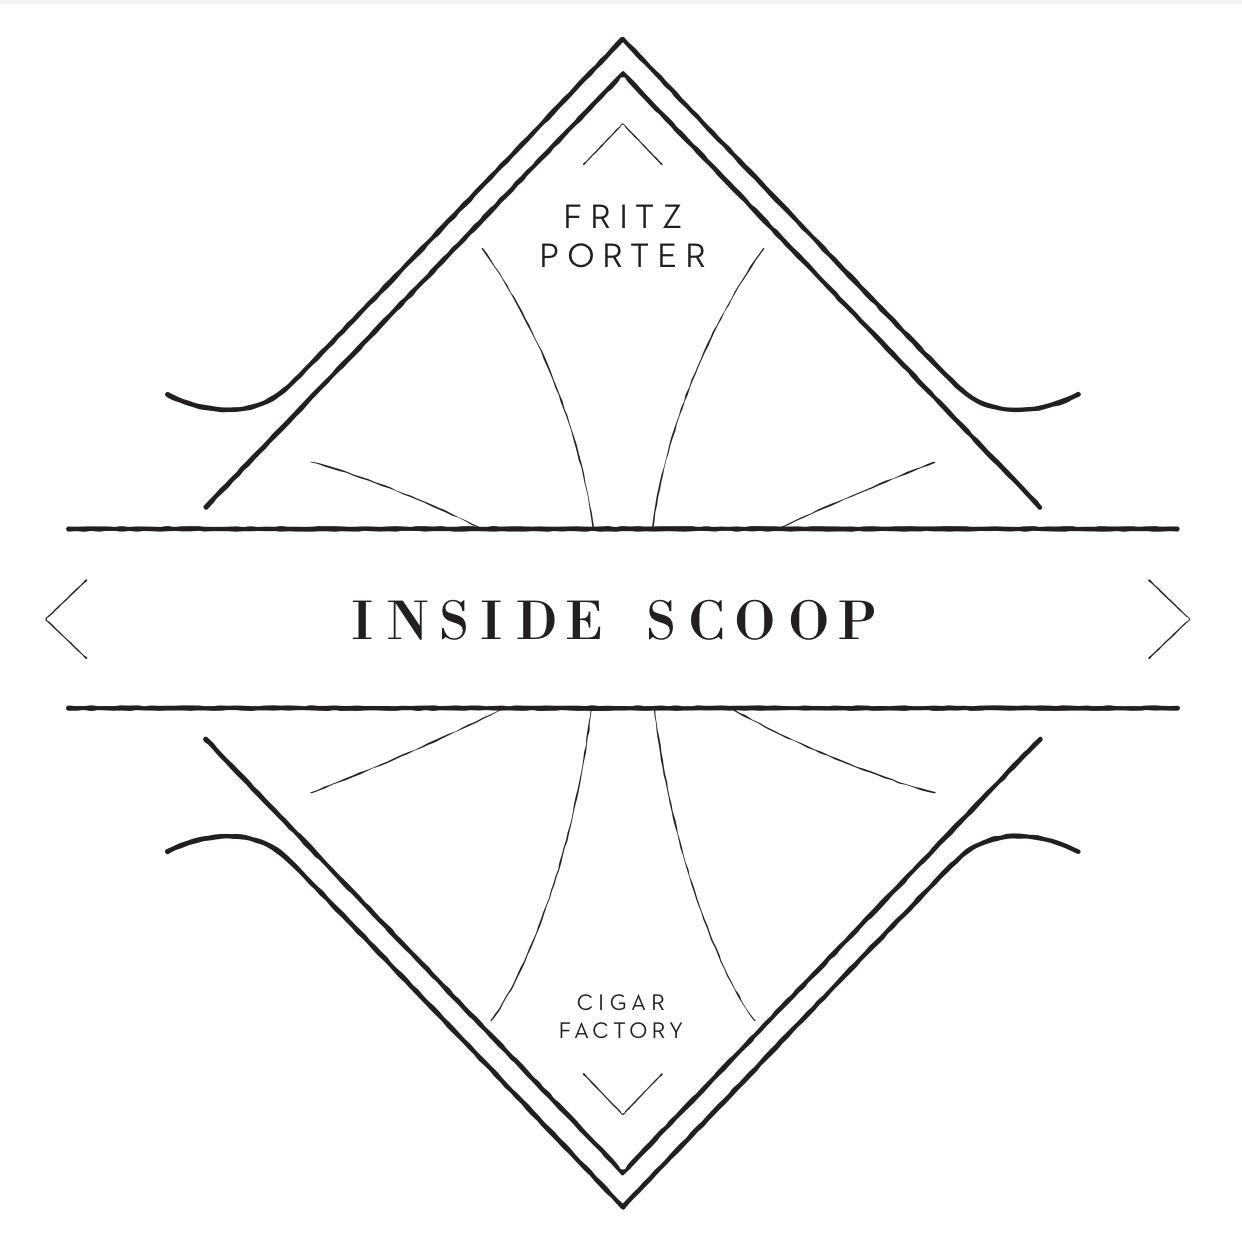 inside scoop diamond logo.jpg